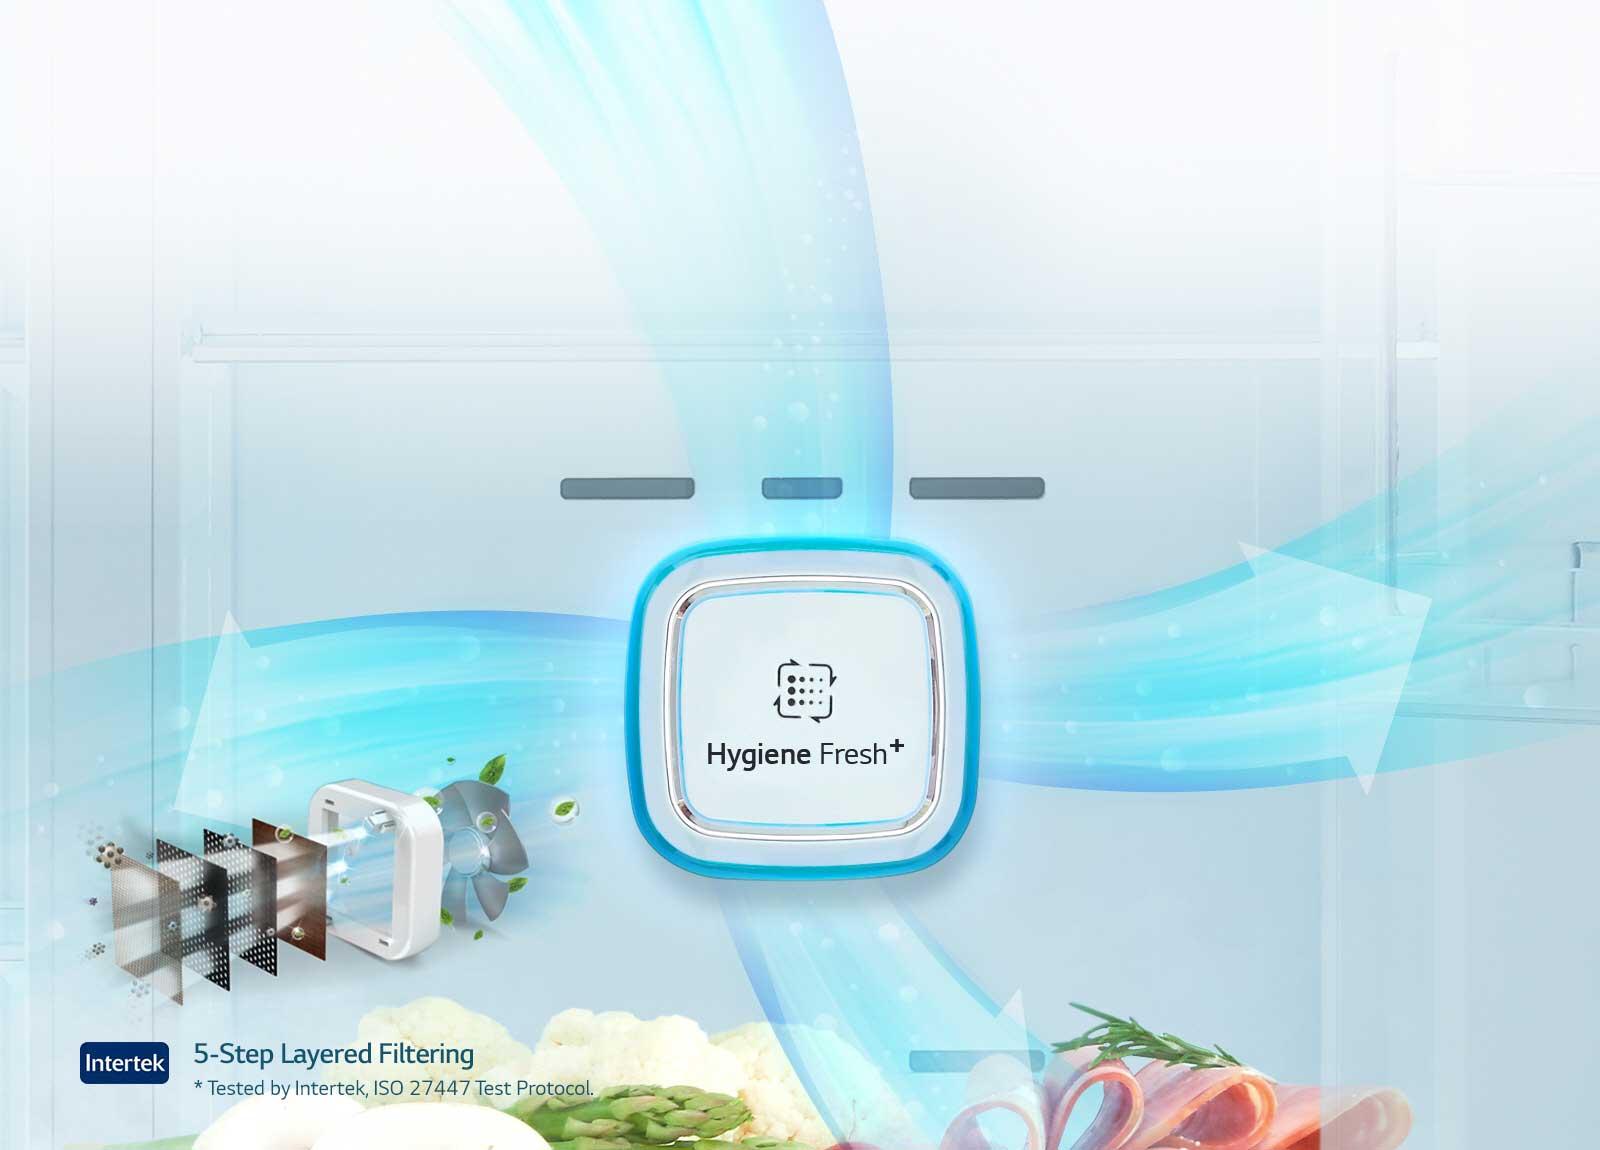 Harga Sharp Sj If85pb Sl Inverter Series Kulkas 640 L Side By Acer E5 575 Hitam Intel Core I3 6006u 4gb Ddr4 128gb Ssd 156ampquot Linux Lg Gc M247ugbv Digital Door In